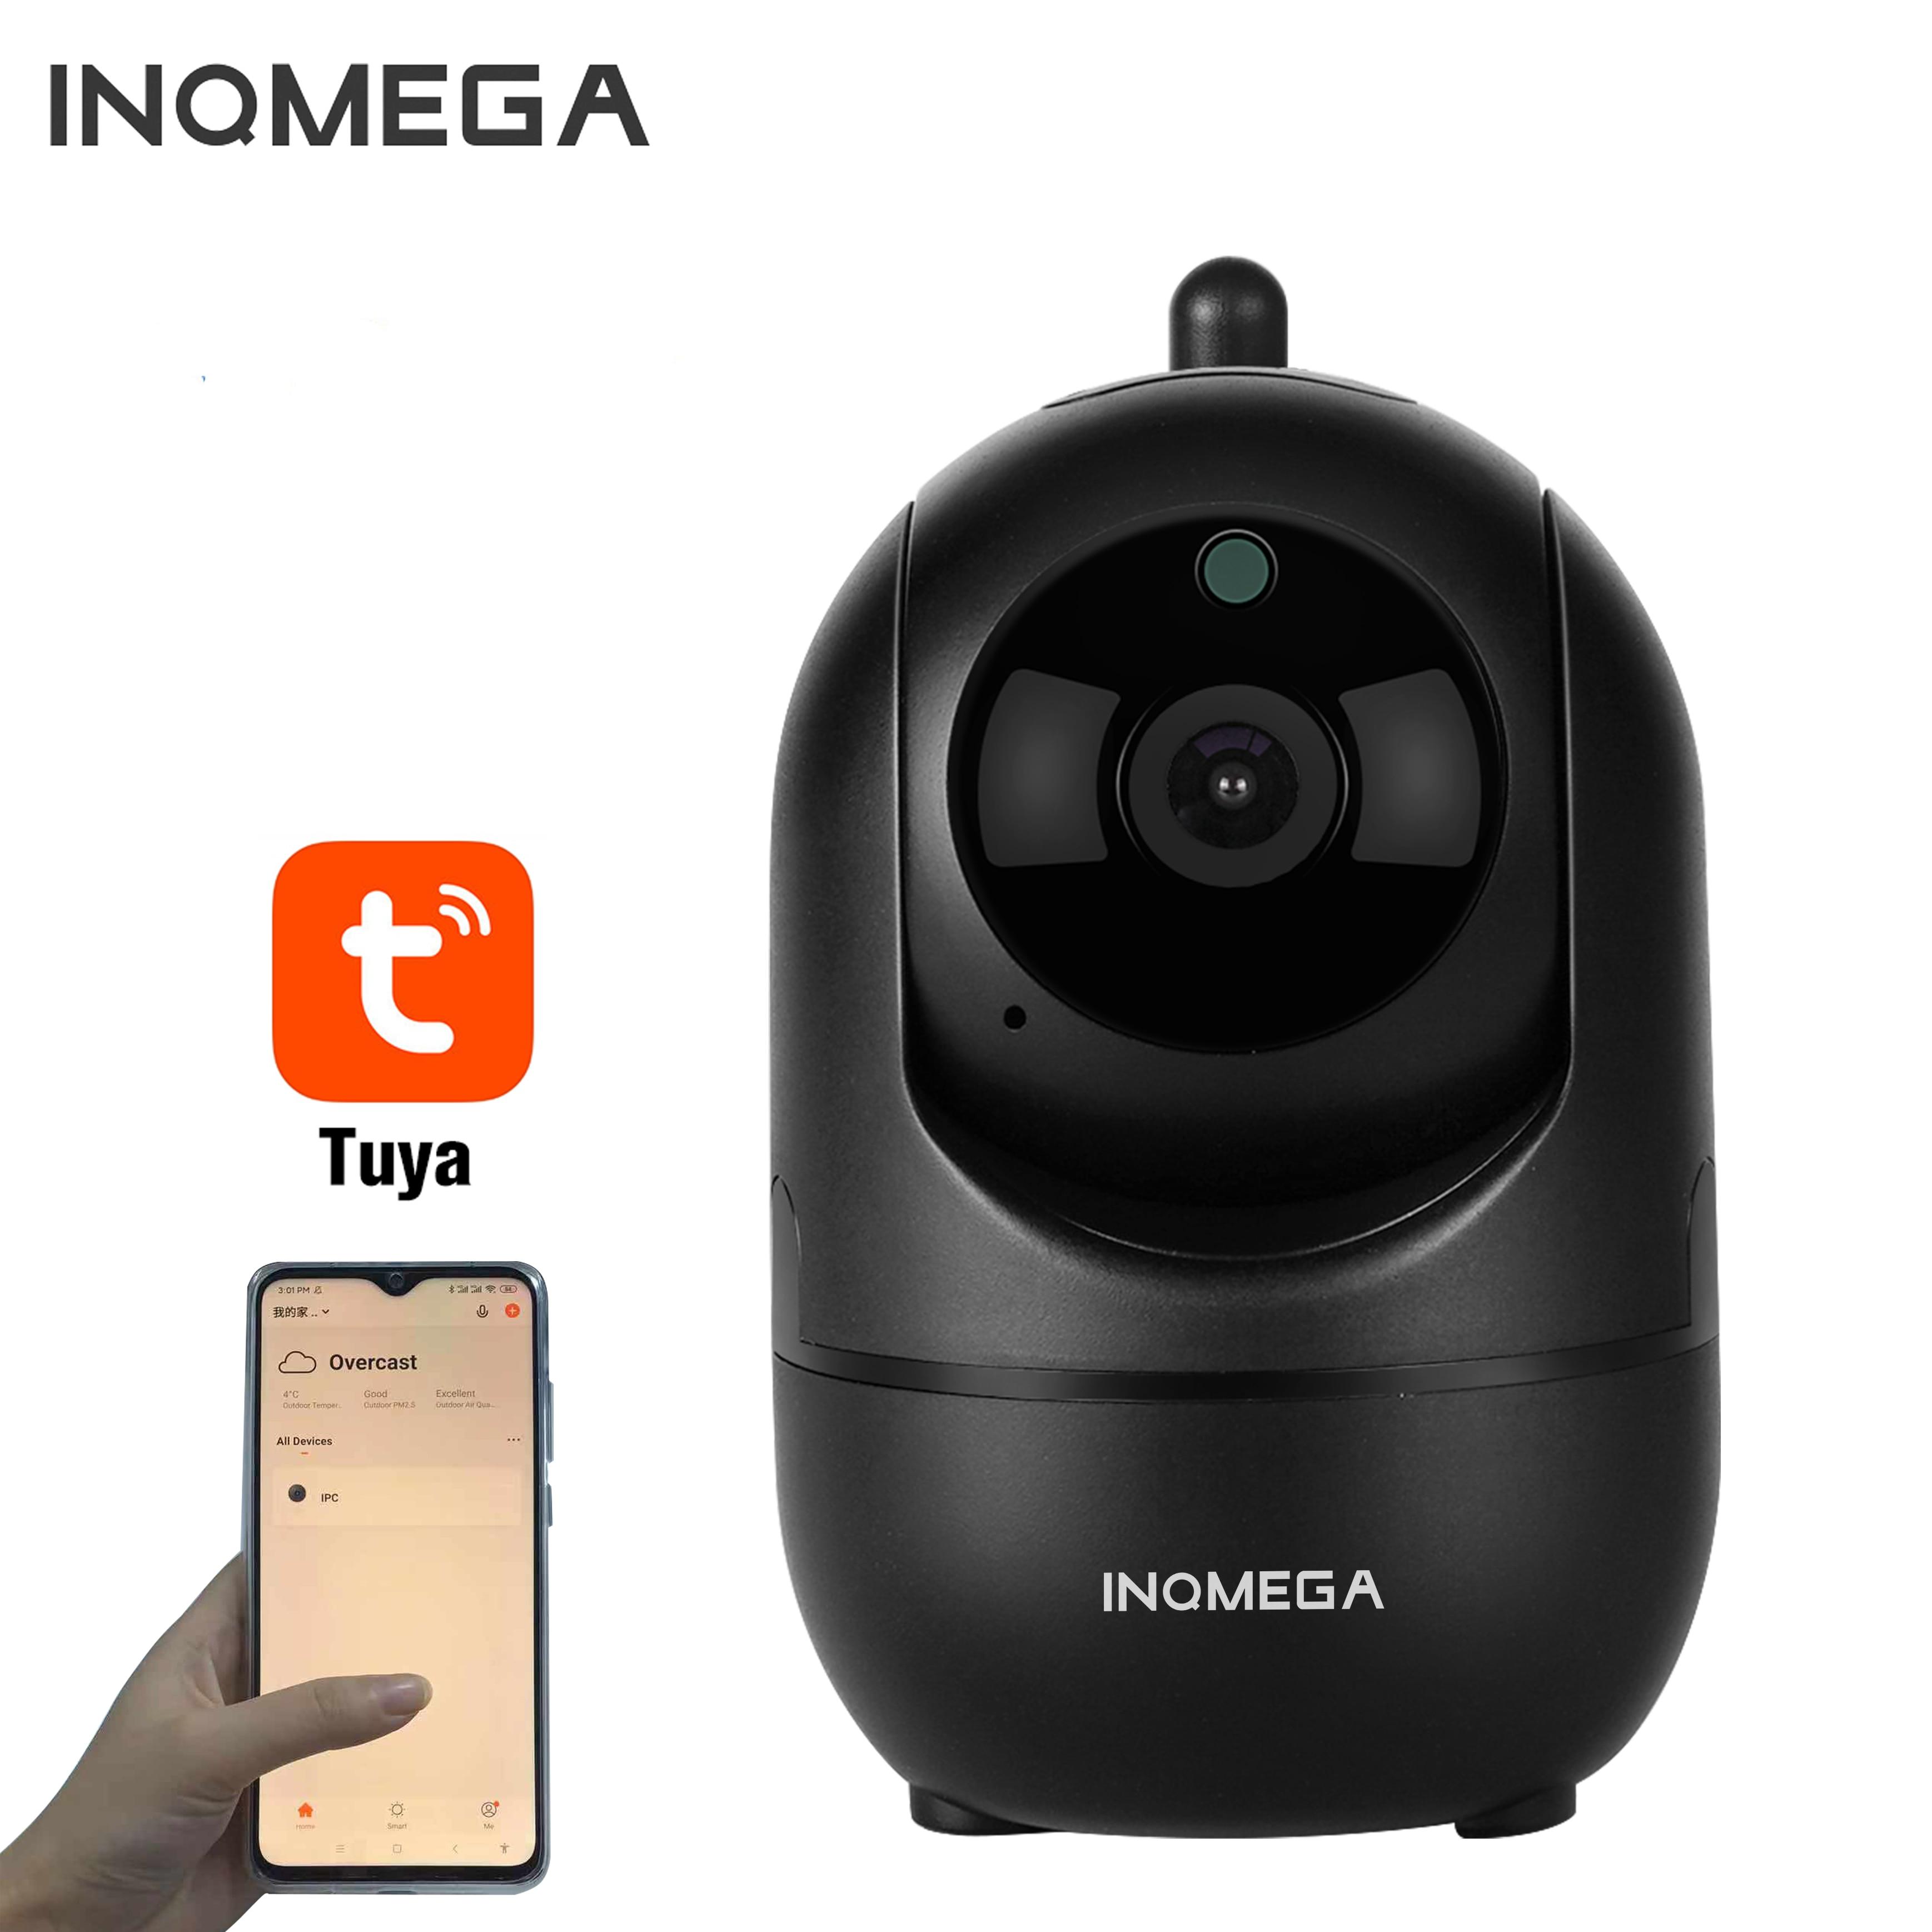 INQMEGA TUYA IP Camera Home Security Surveillance Camera CCTV Network Wifi Kamera Wireless Cam Tuya Smart Life Baby Moniter